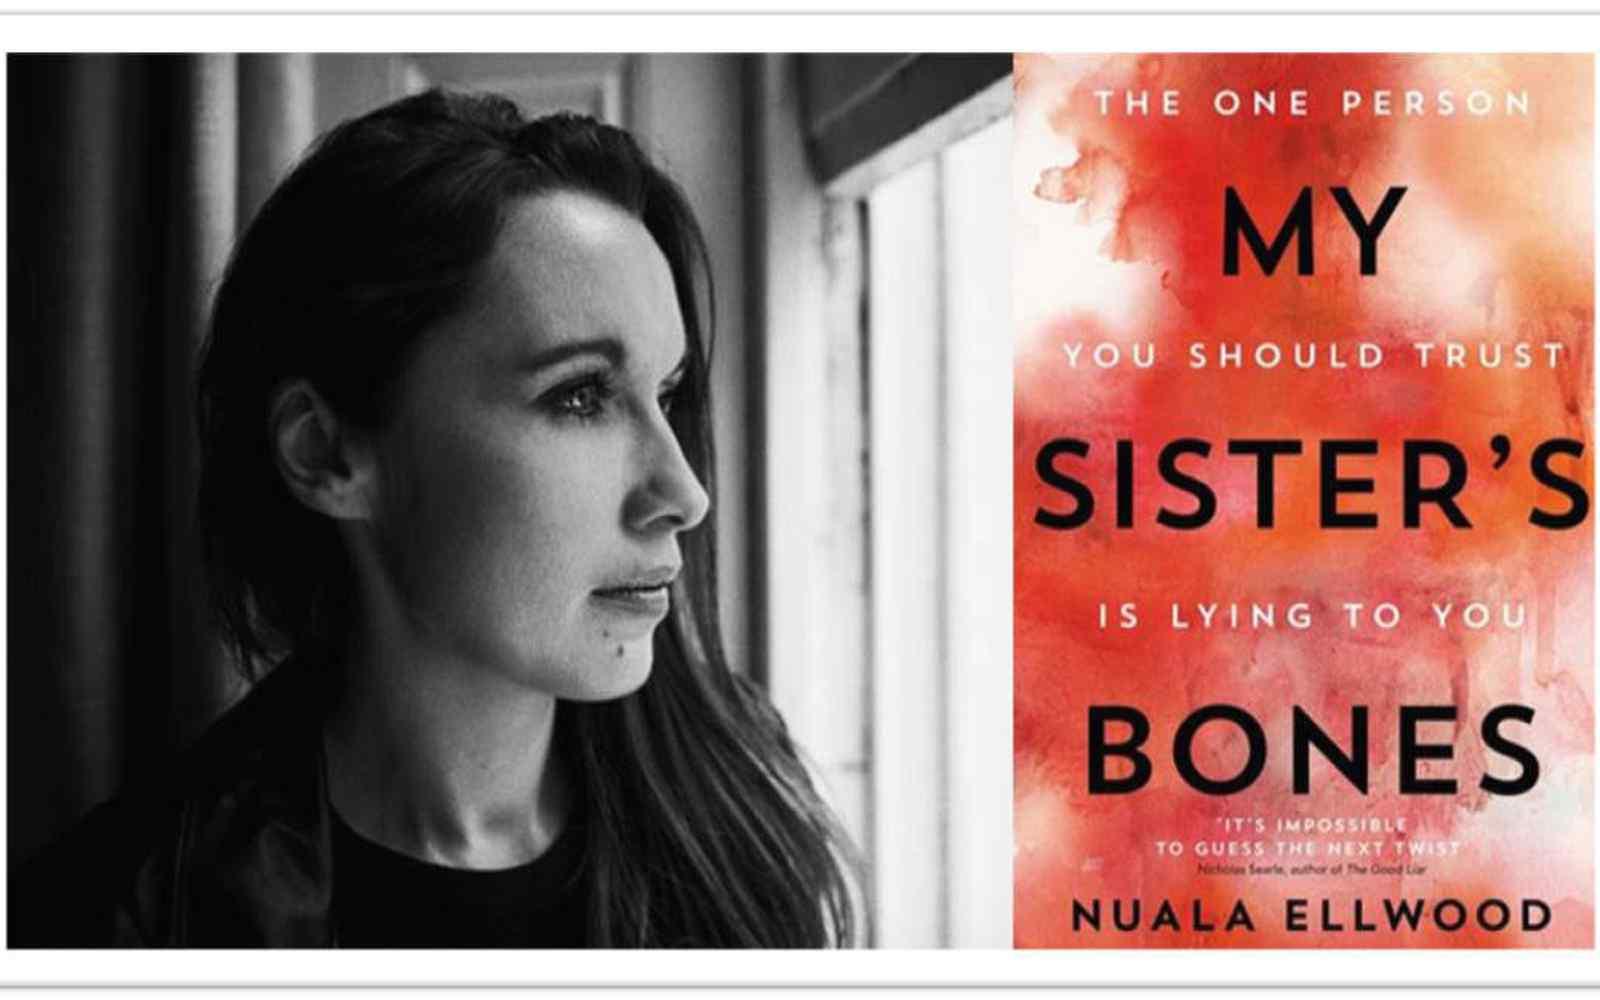 Nuala Ellwood and book  - My Sister's Bones